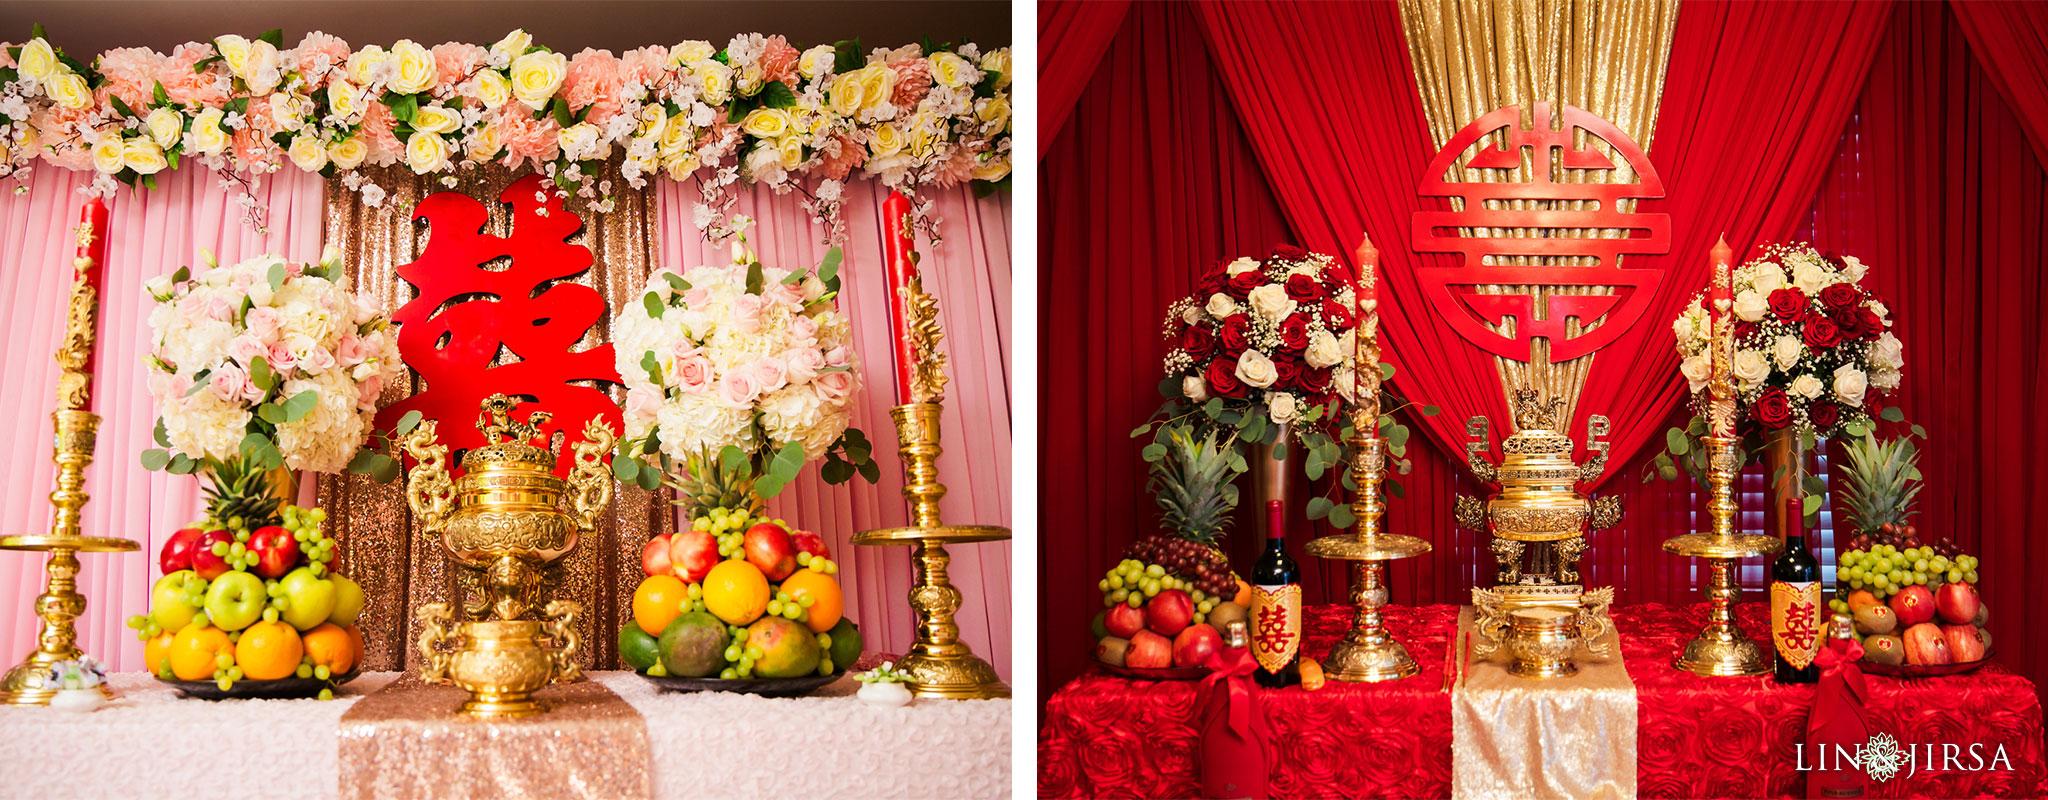 005 orange county vietnamese wedding photography